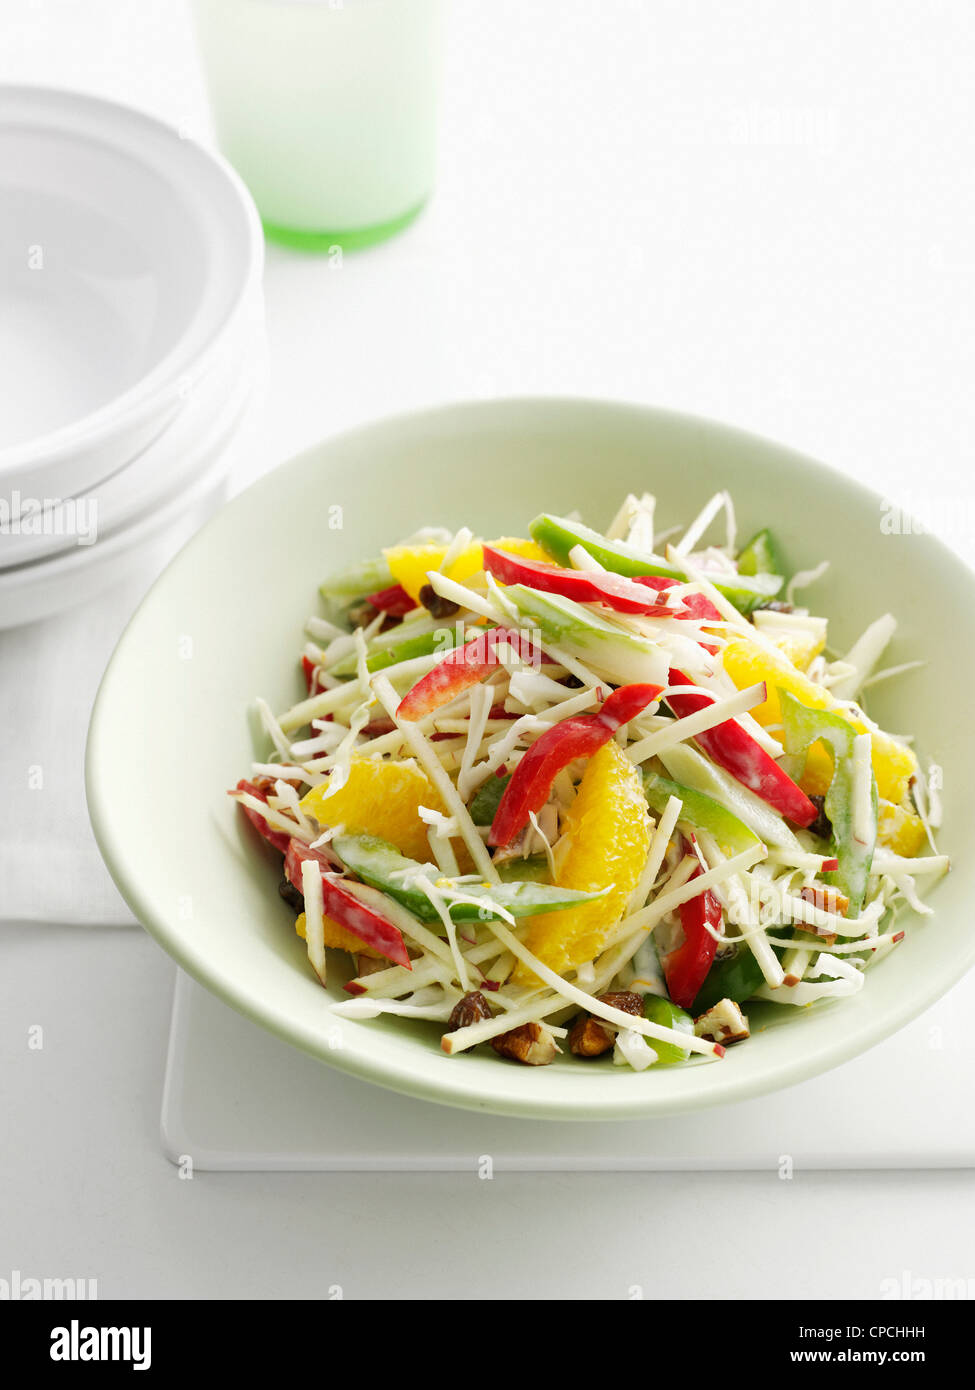 Close up of bowl of fruit salad - Stock Image